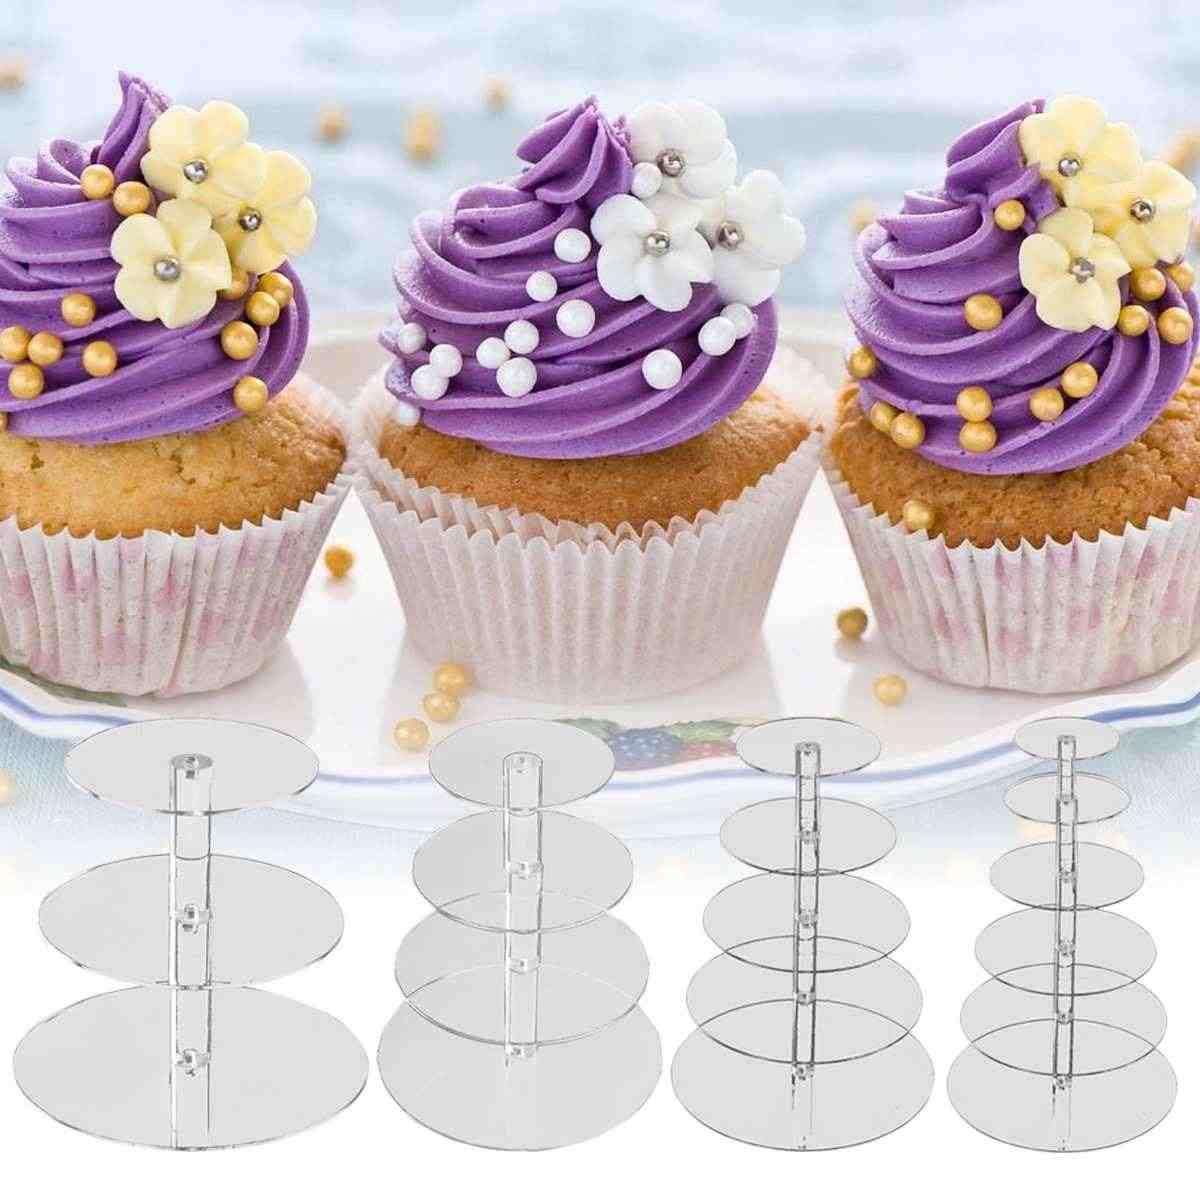 DHOUTDOORS Soporte Cupcake Acr/ílico Transparente para Cupcakes 4 Niveles para Bodas y Fiestas para Tartas Postres Muffins Cupcake Stand para Fiestas Bodas Cumplea/ños